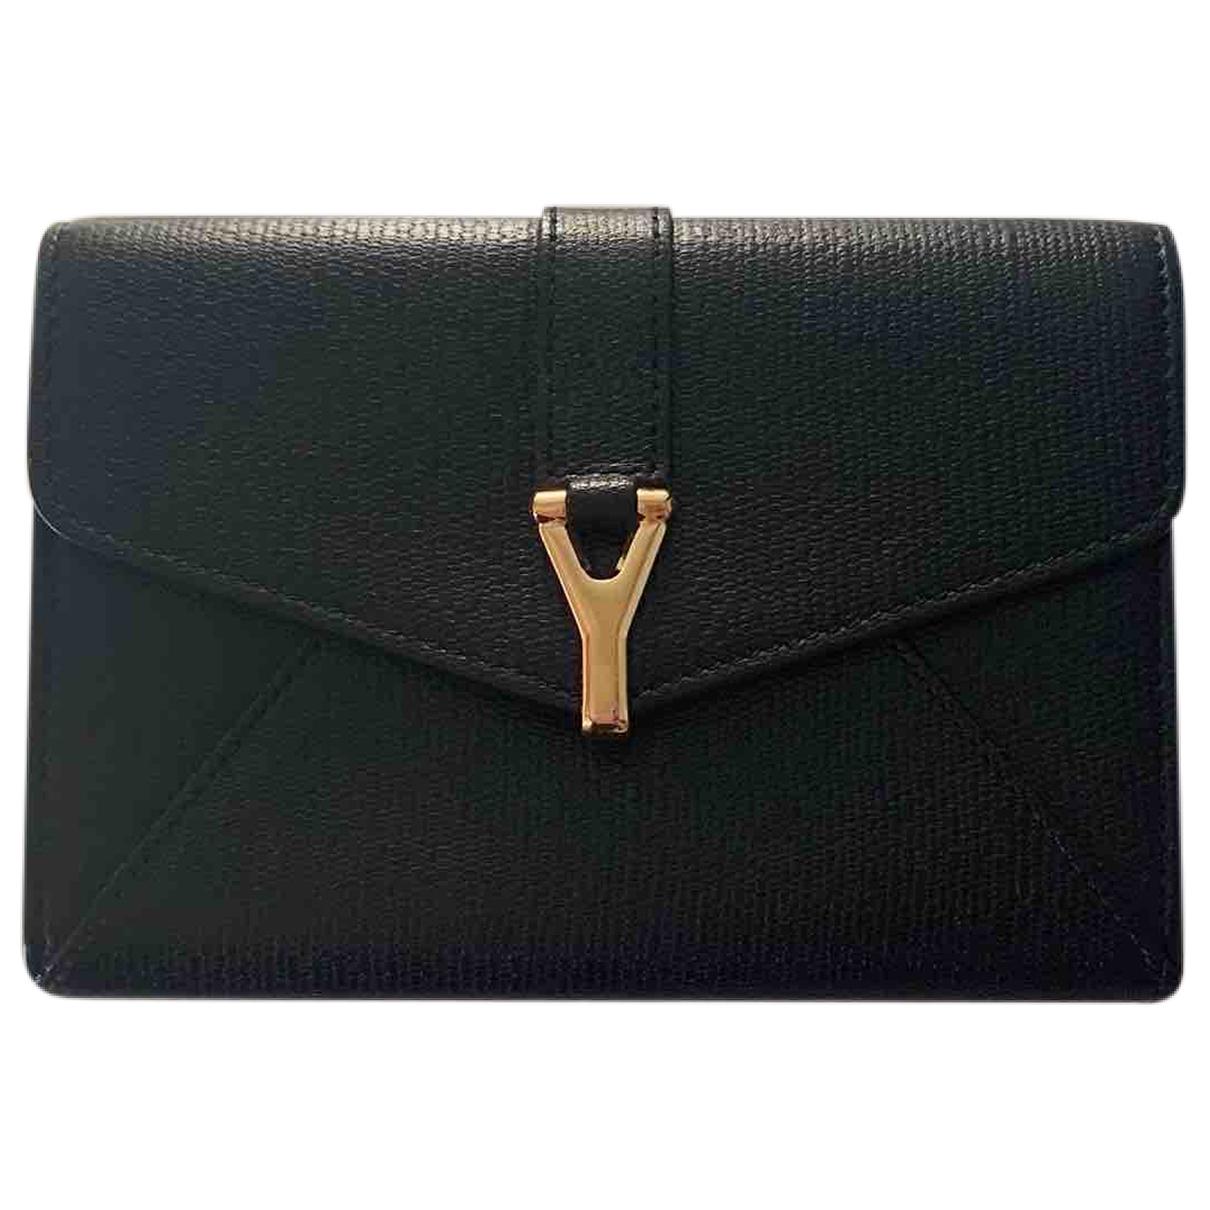 Yves Saint Laurent \N Black Leather Purses, wallet & cases for Women \N